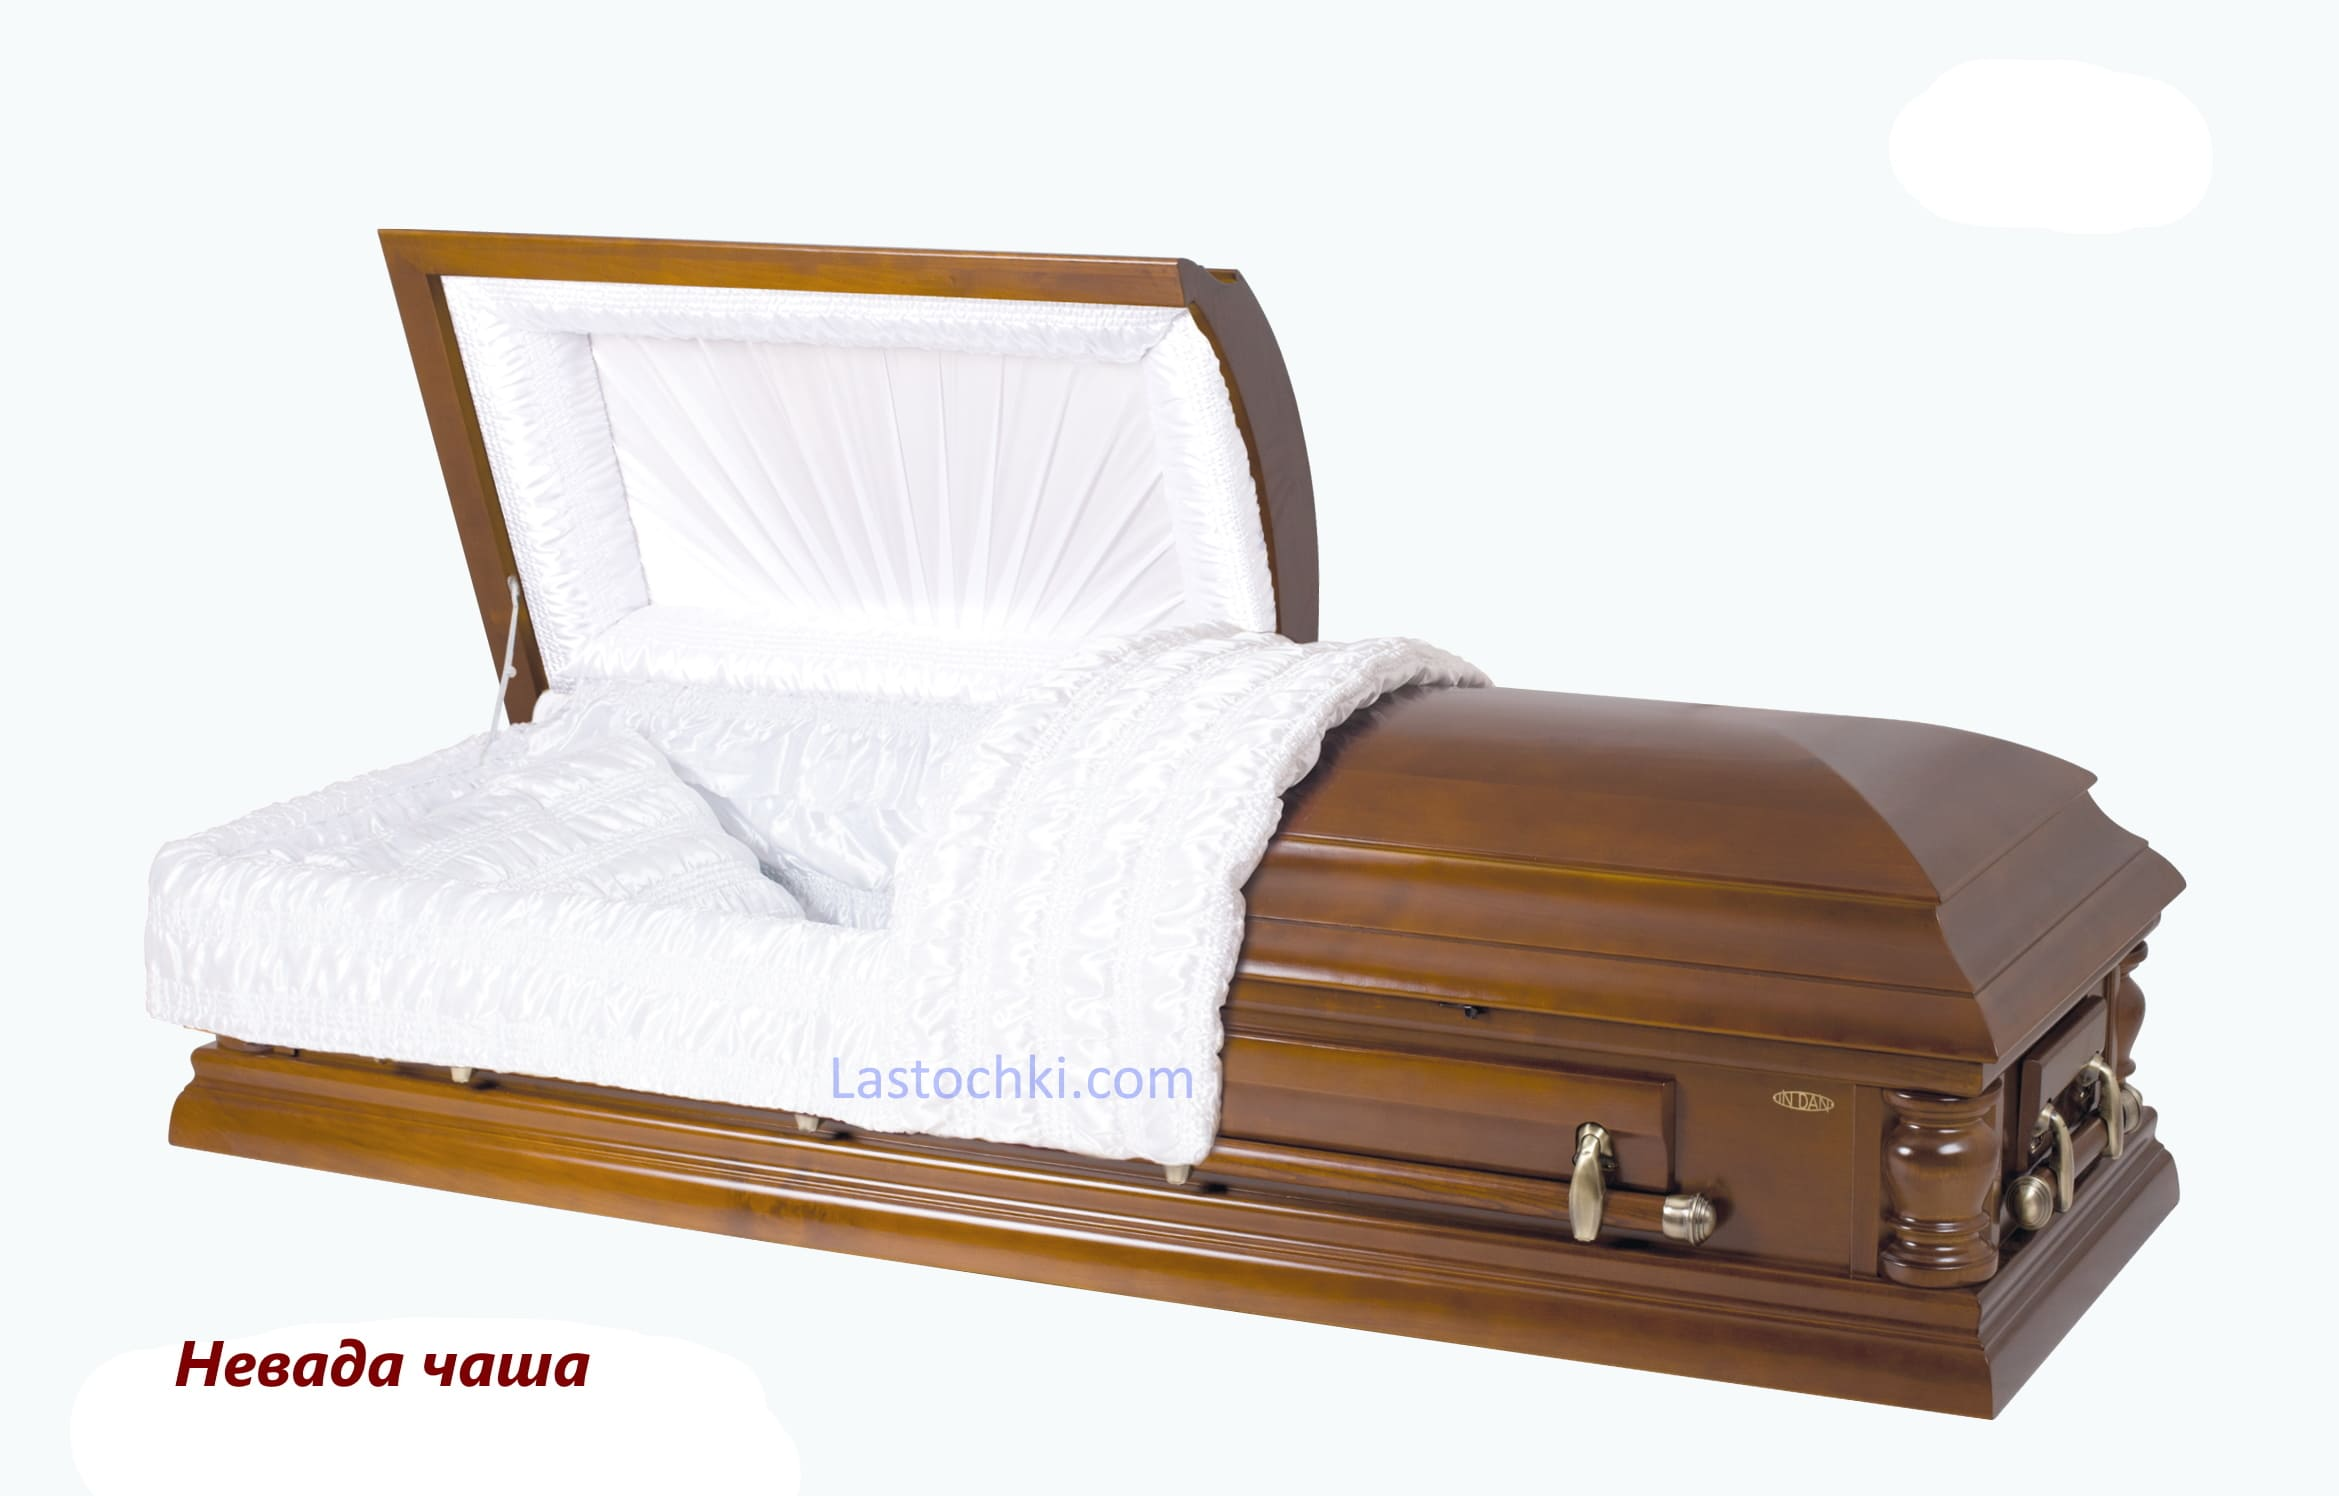 Саркофаг Невада чаша -  Цена 60 000 грн.